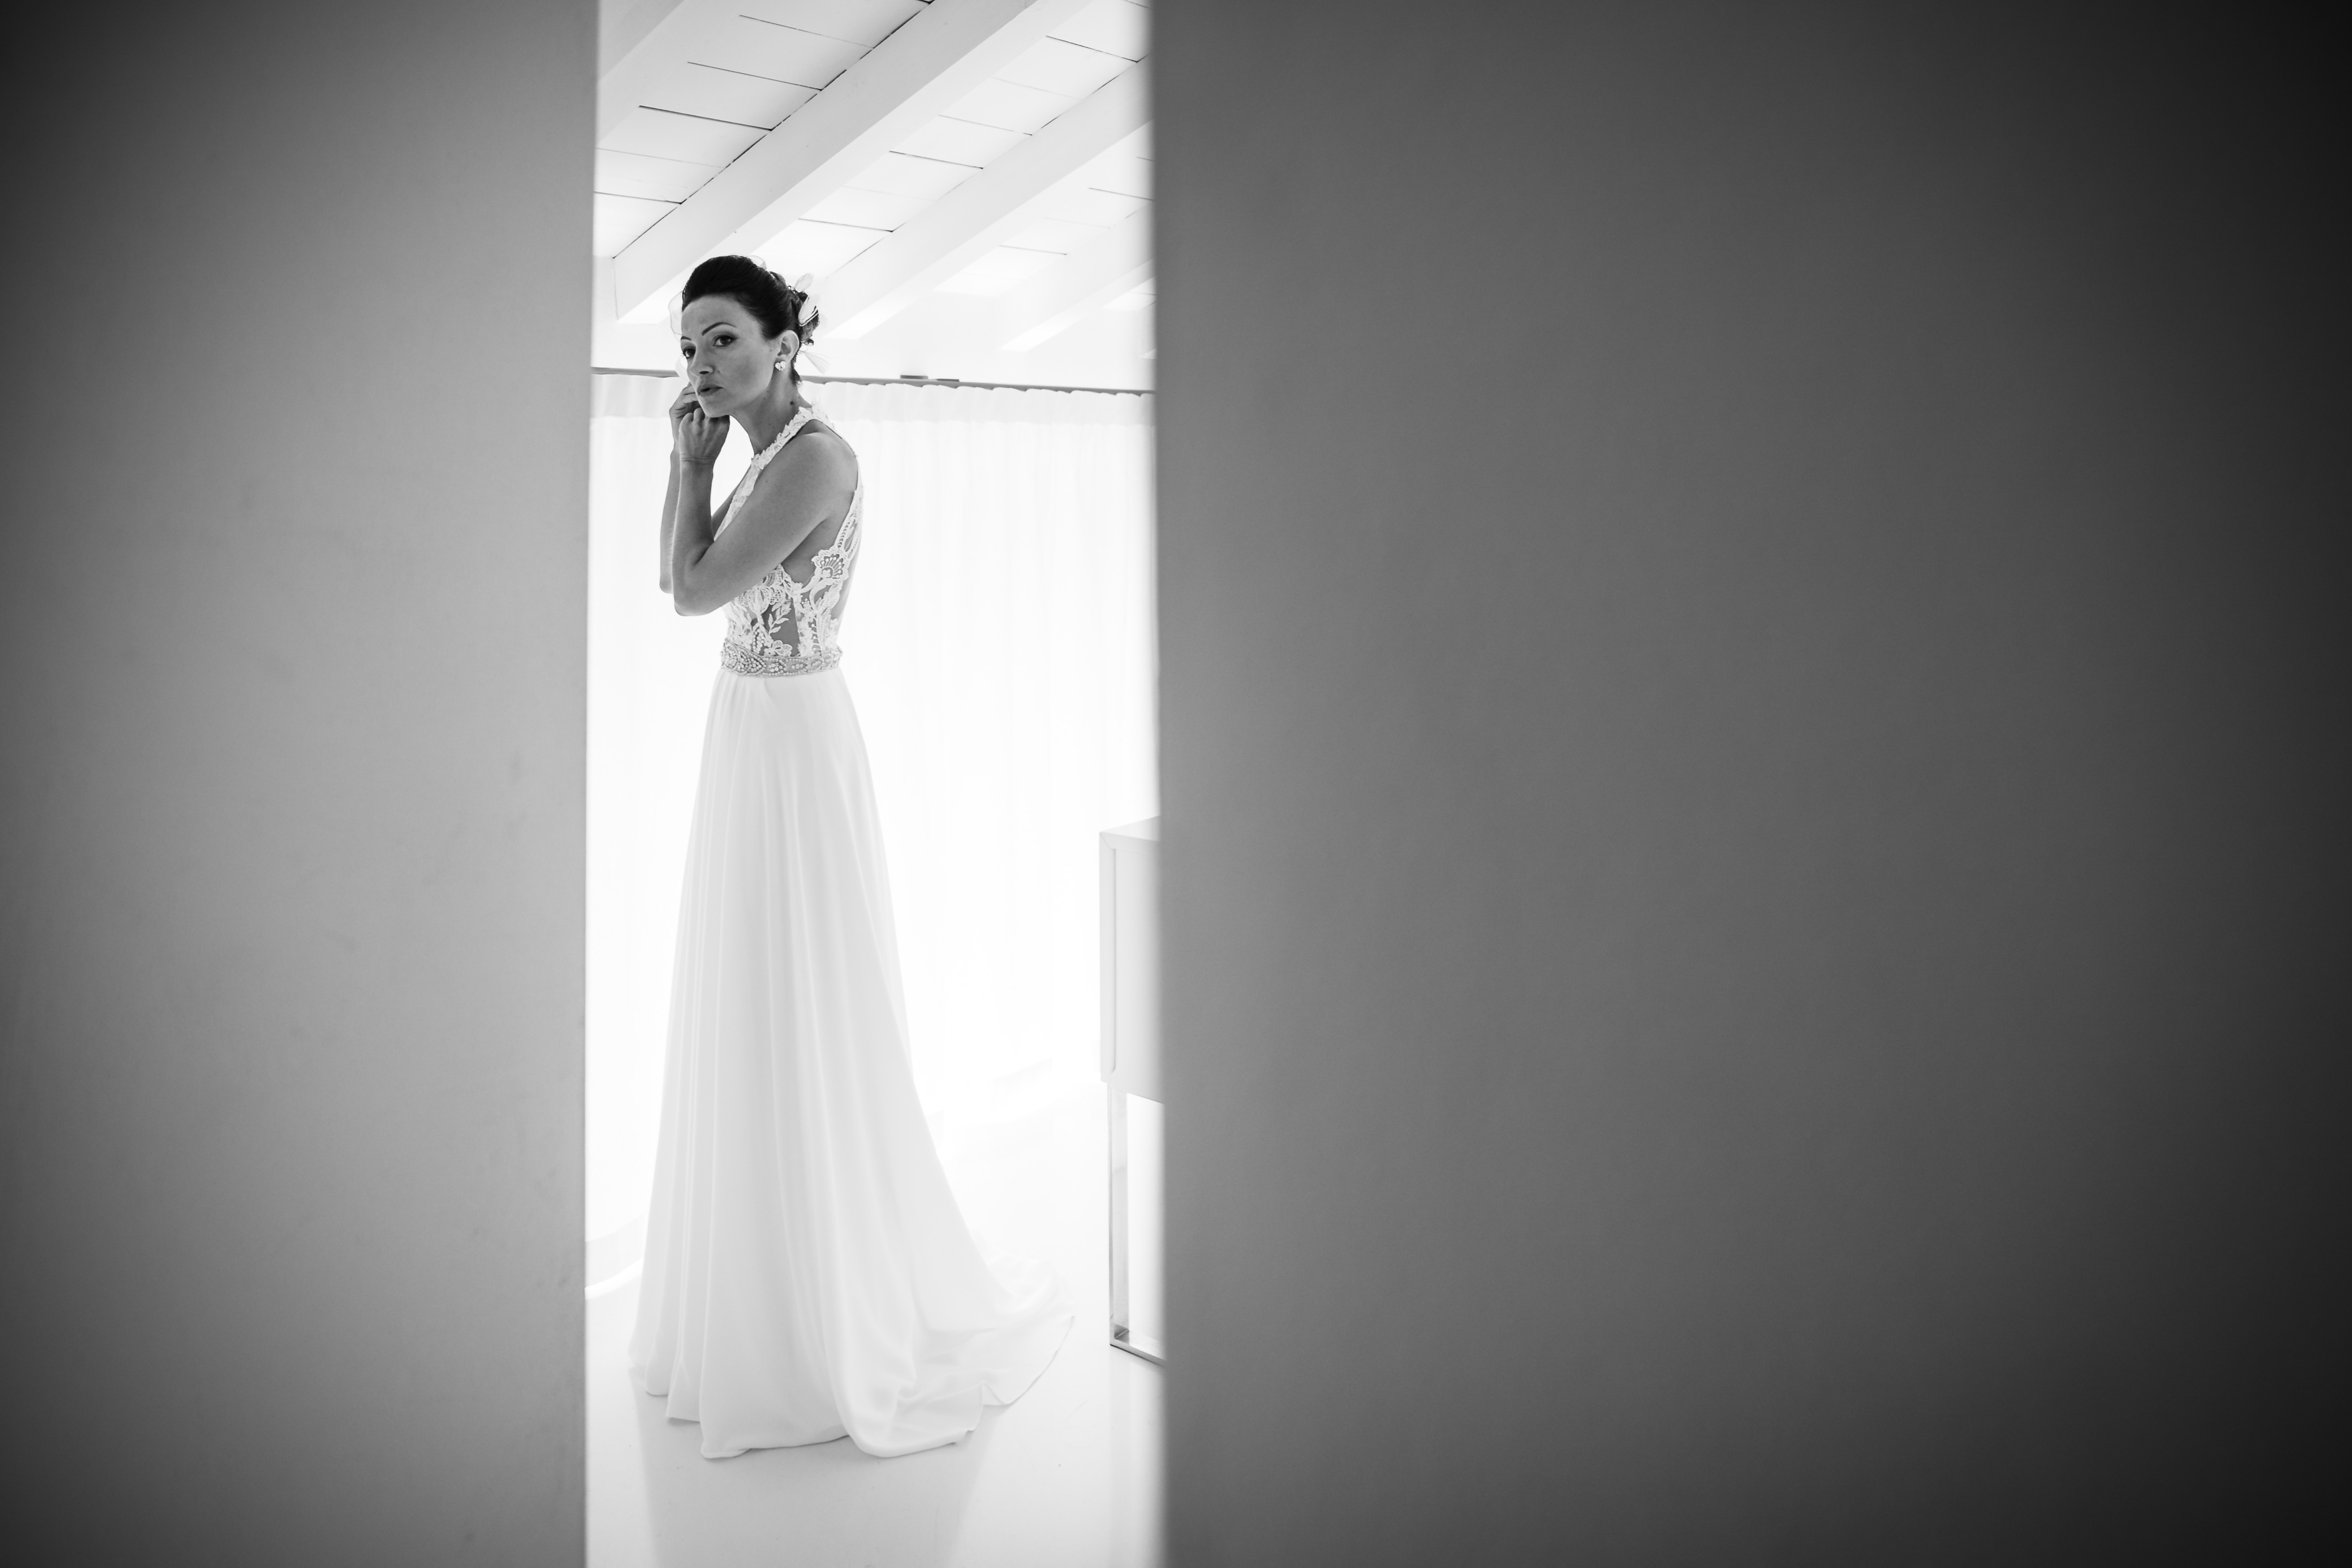 0005_gilberti_ricca_castello_oldofredi_montisola_fotografi_matrimonio